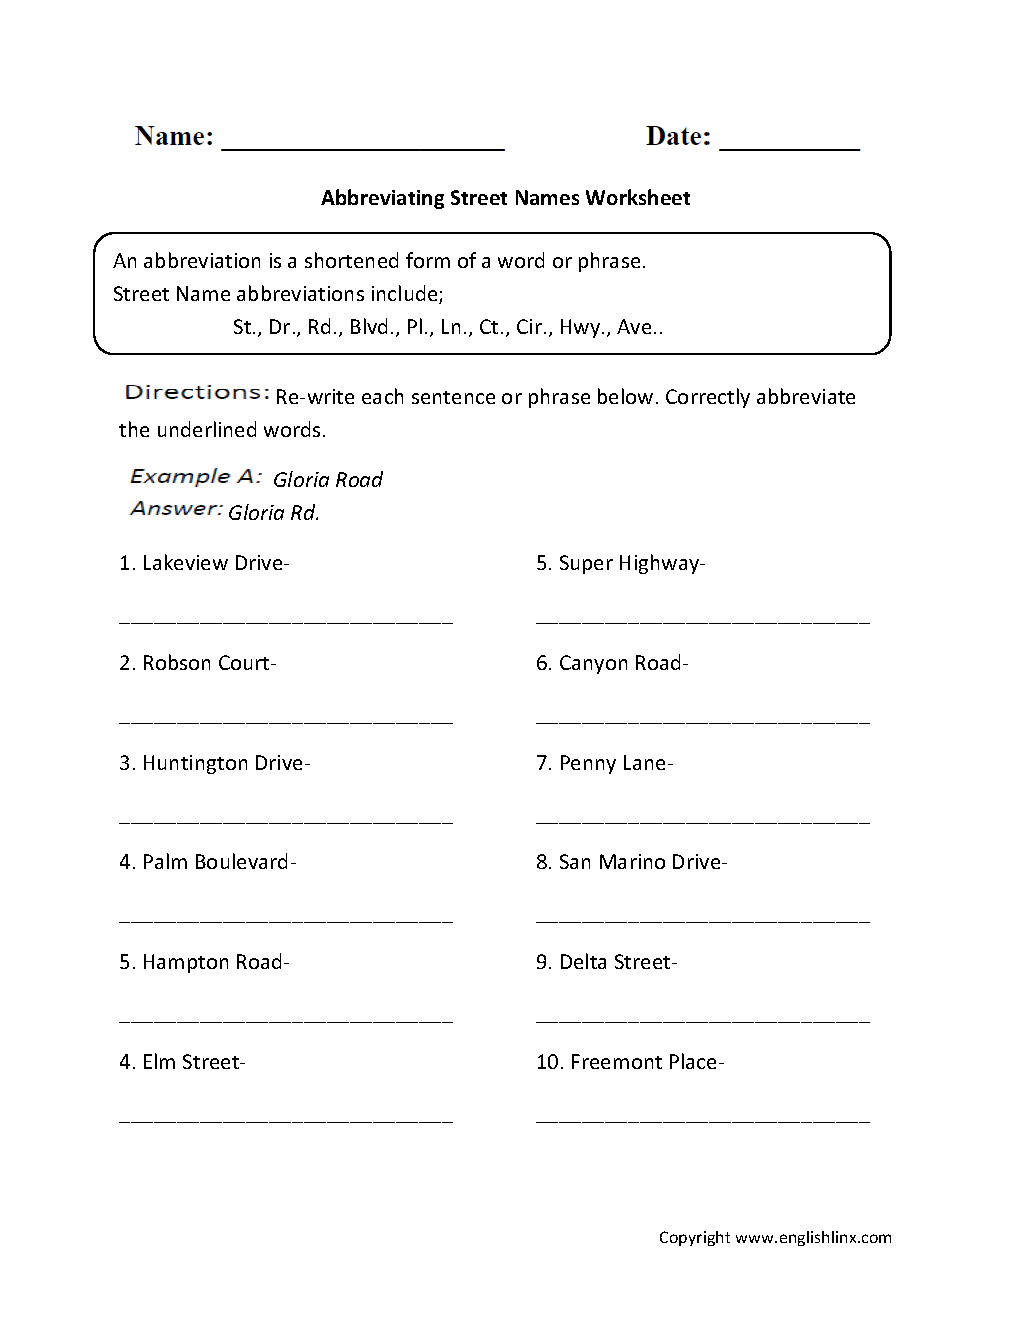 Englishlinx.com   Abbreviations Worksheets   2nd grade worksheets [ 1331 x 1012 Pixel ]